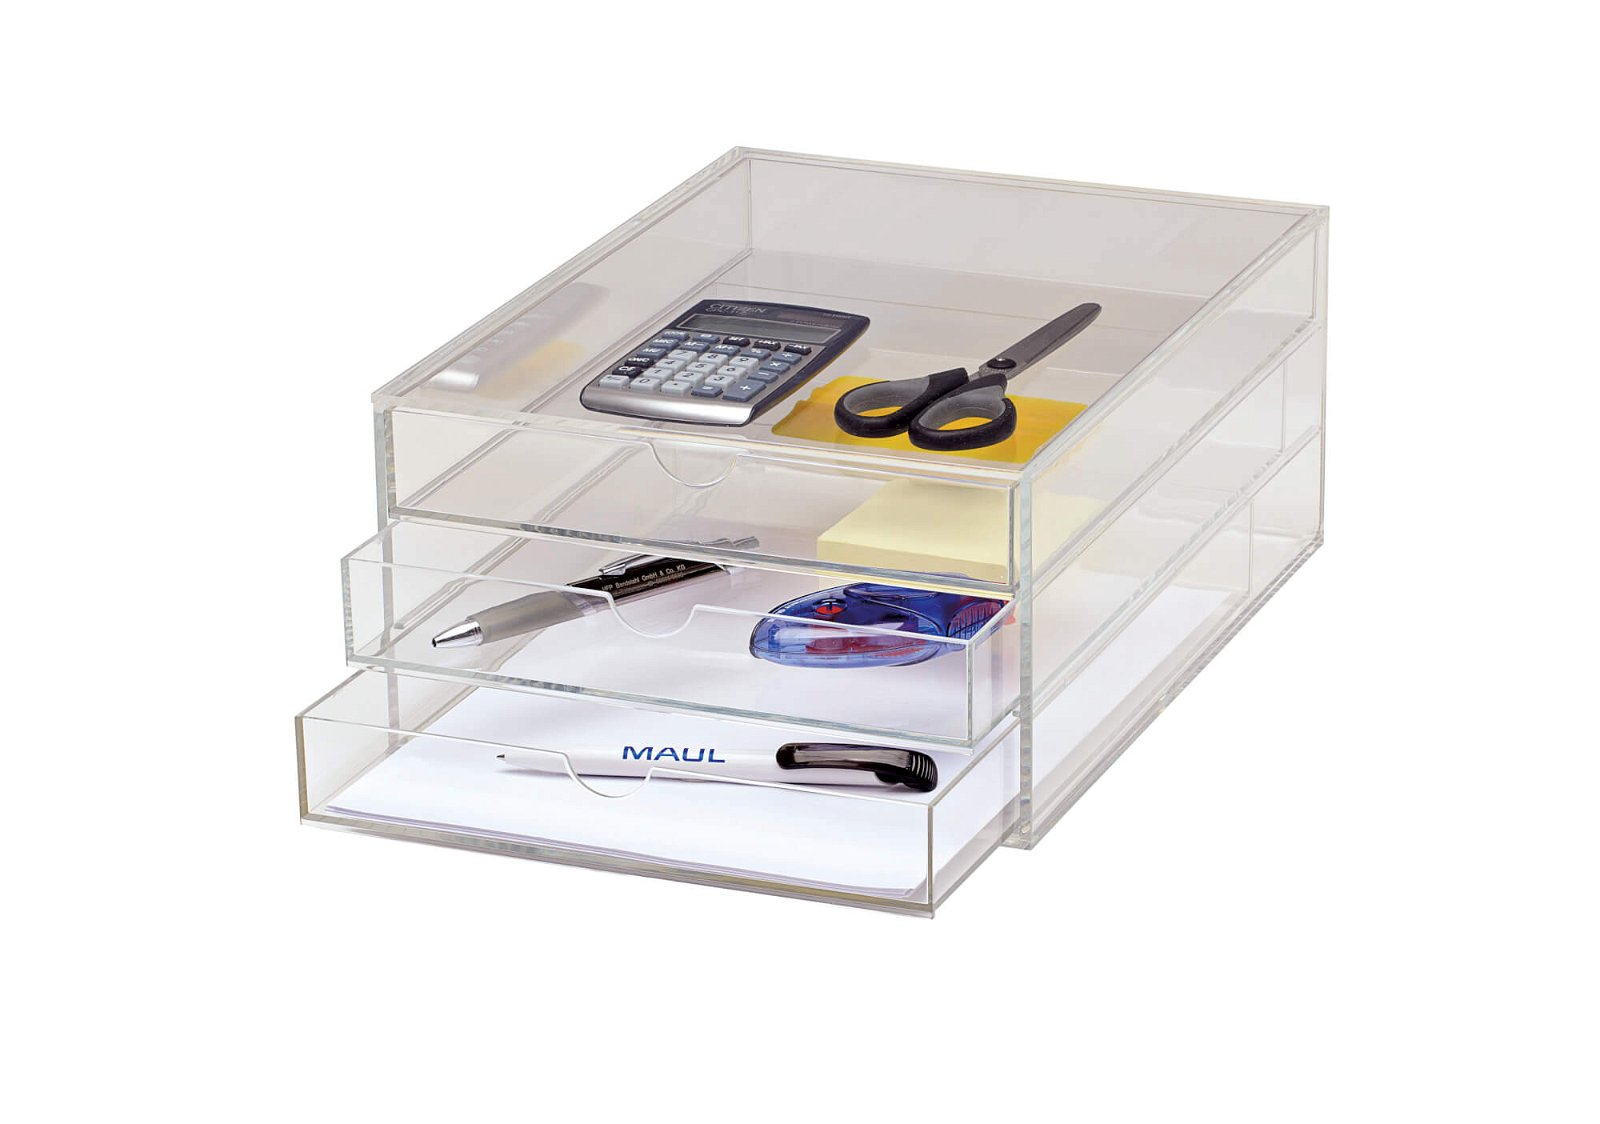 Acryl-Schubladenbox, DIN A4, 3 Laden, glasklar